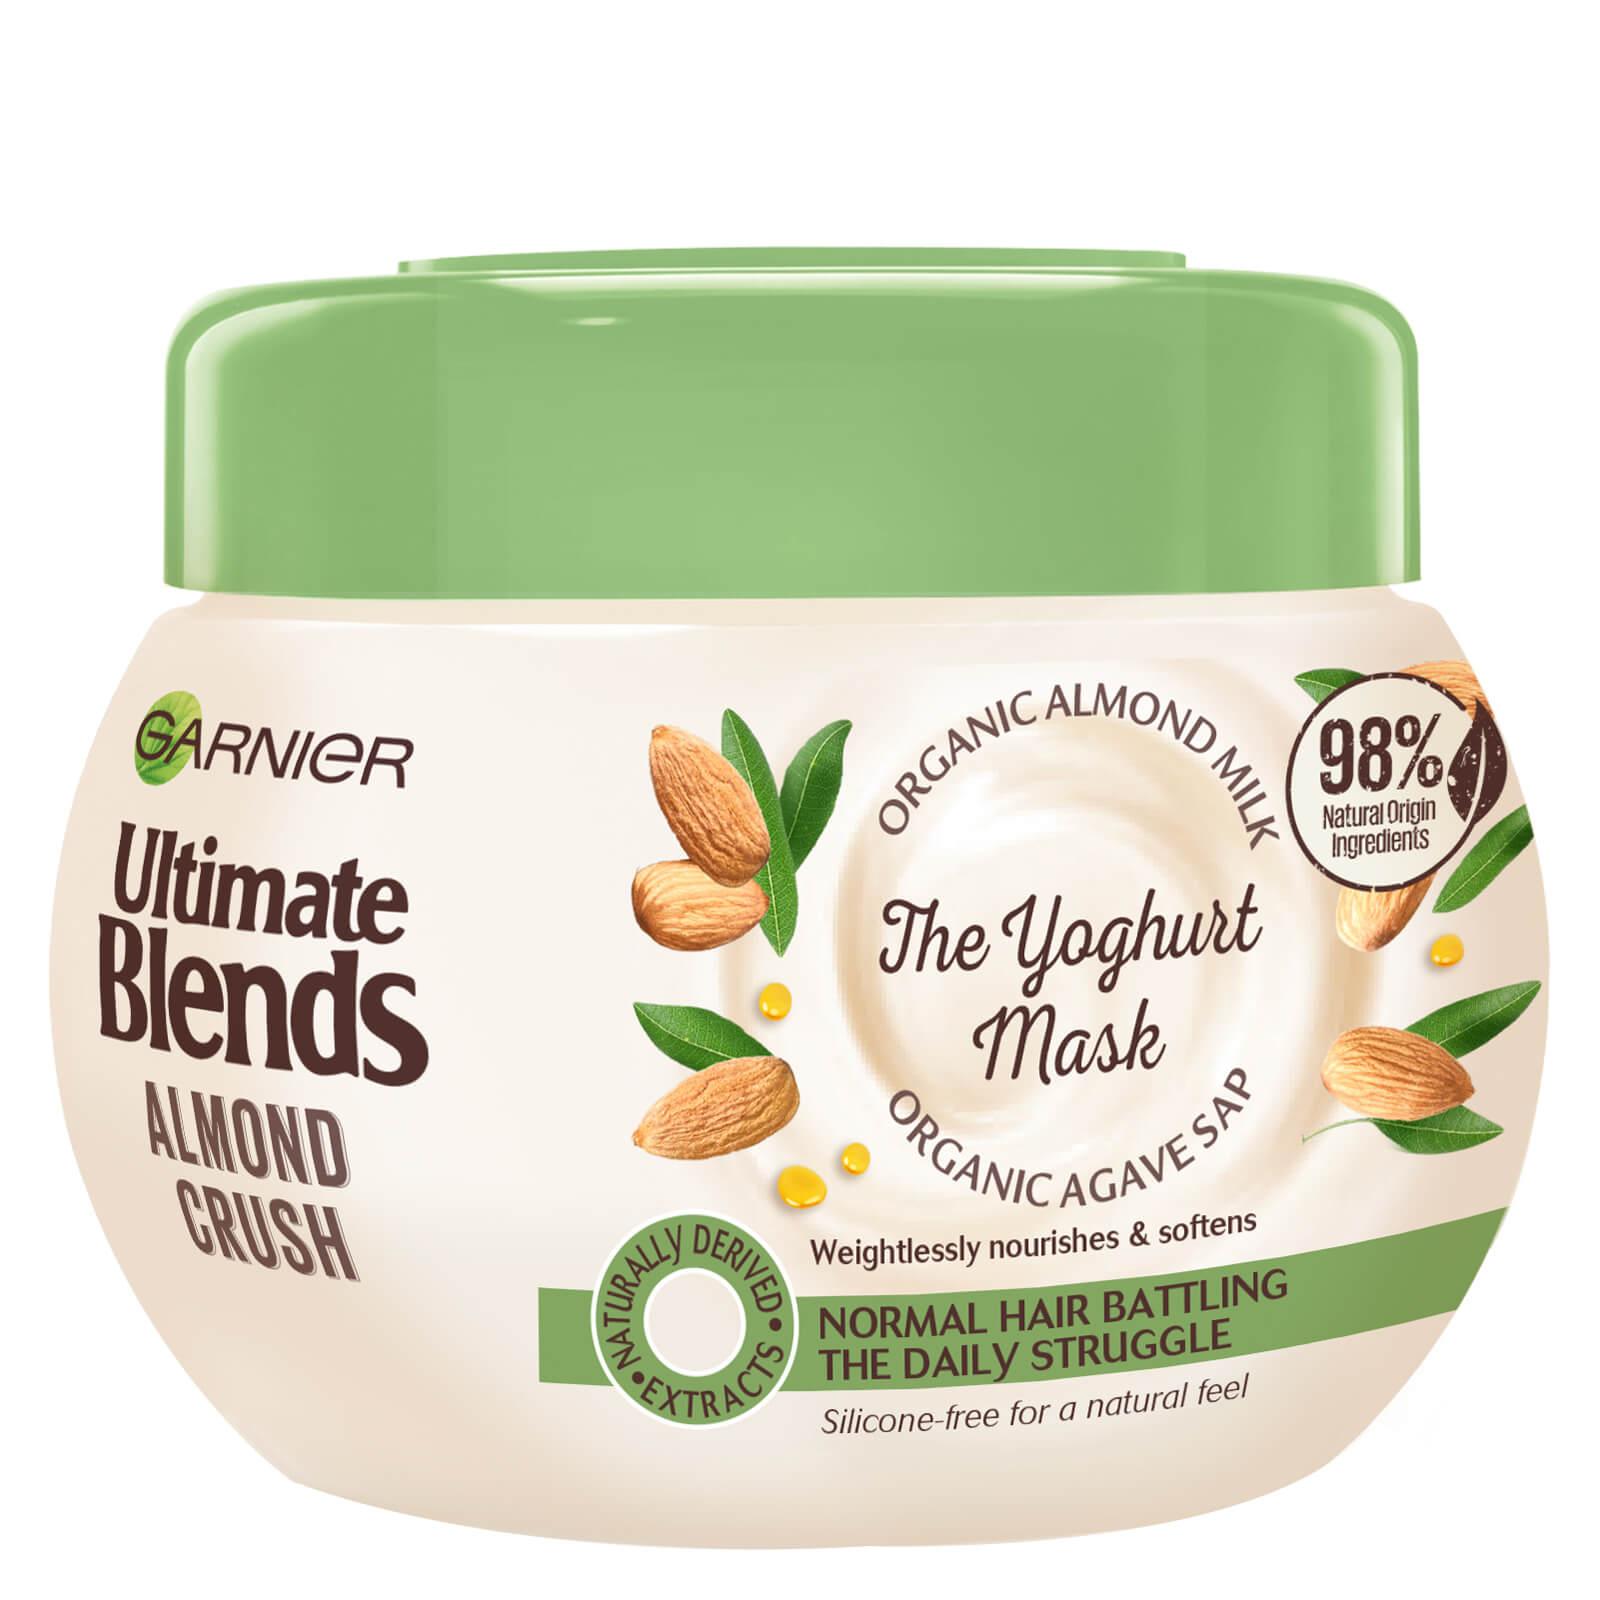 Купить Garnier Ultimate Blends Almond Milk Normal Hair Treatment Mask 300ml